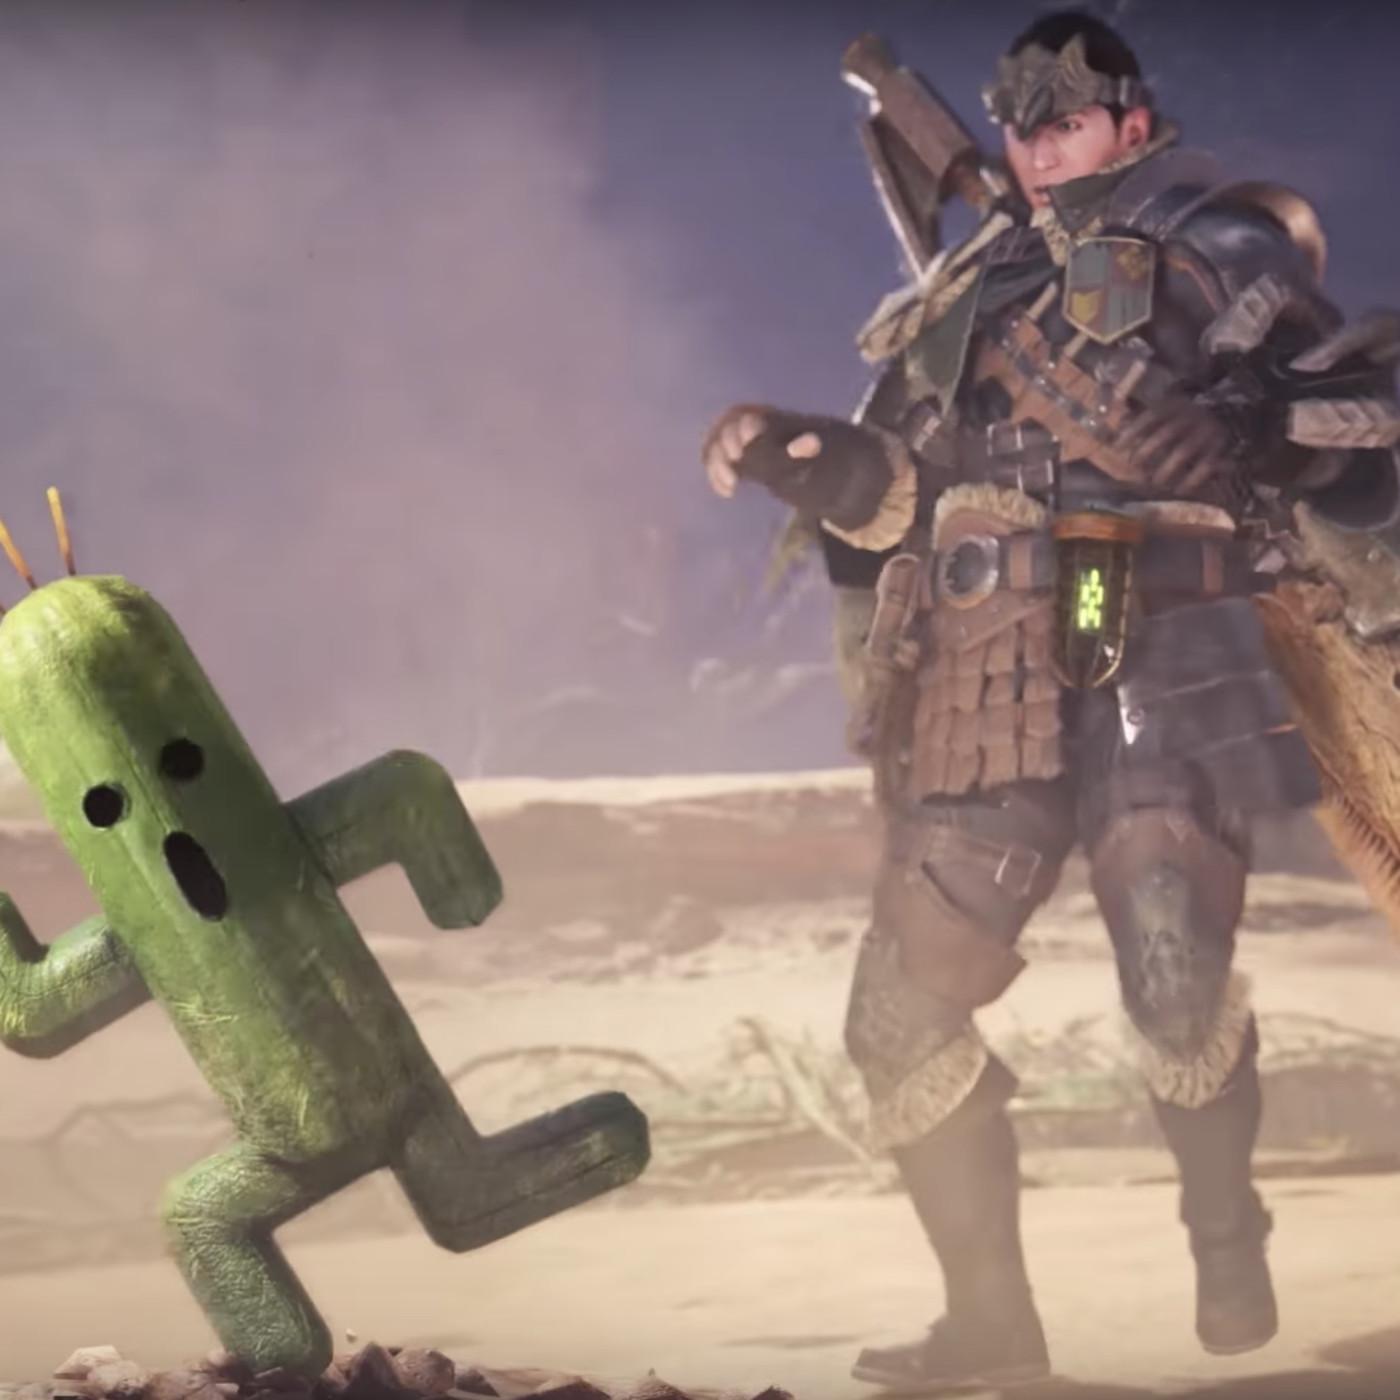 Monster Hunter: World is getting Final Fantasy 14 enemies